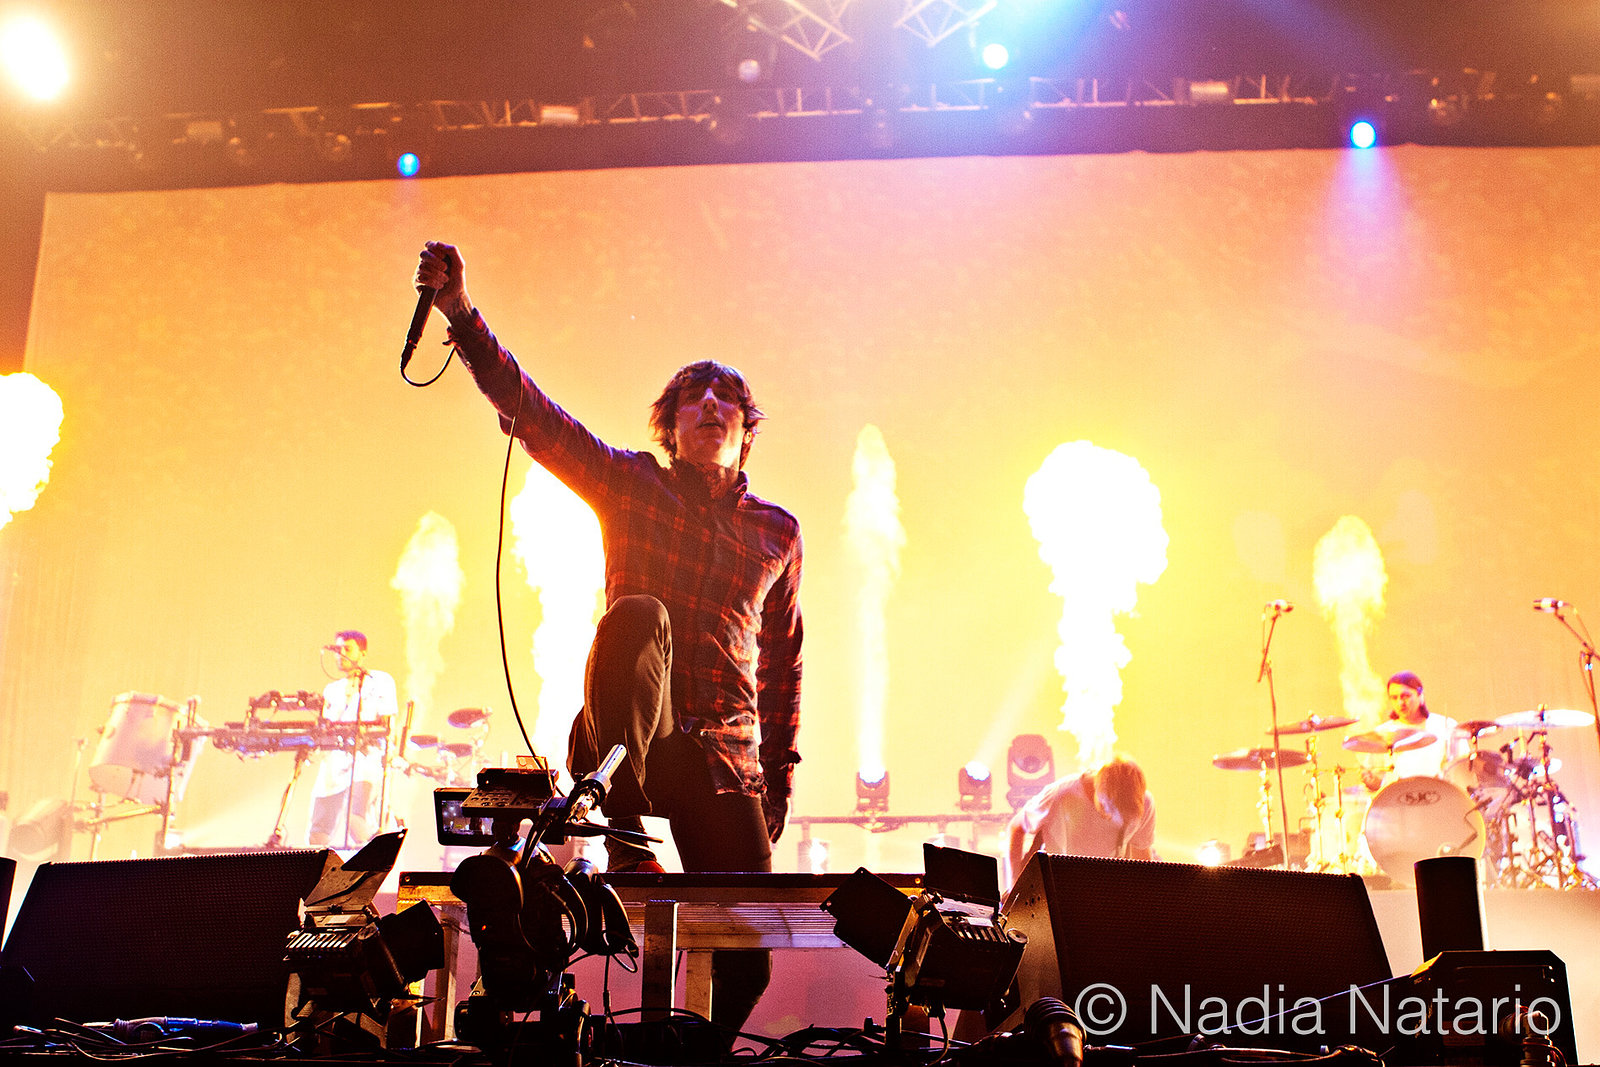 Bring Me The Horizon at Wembley Arena